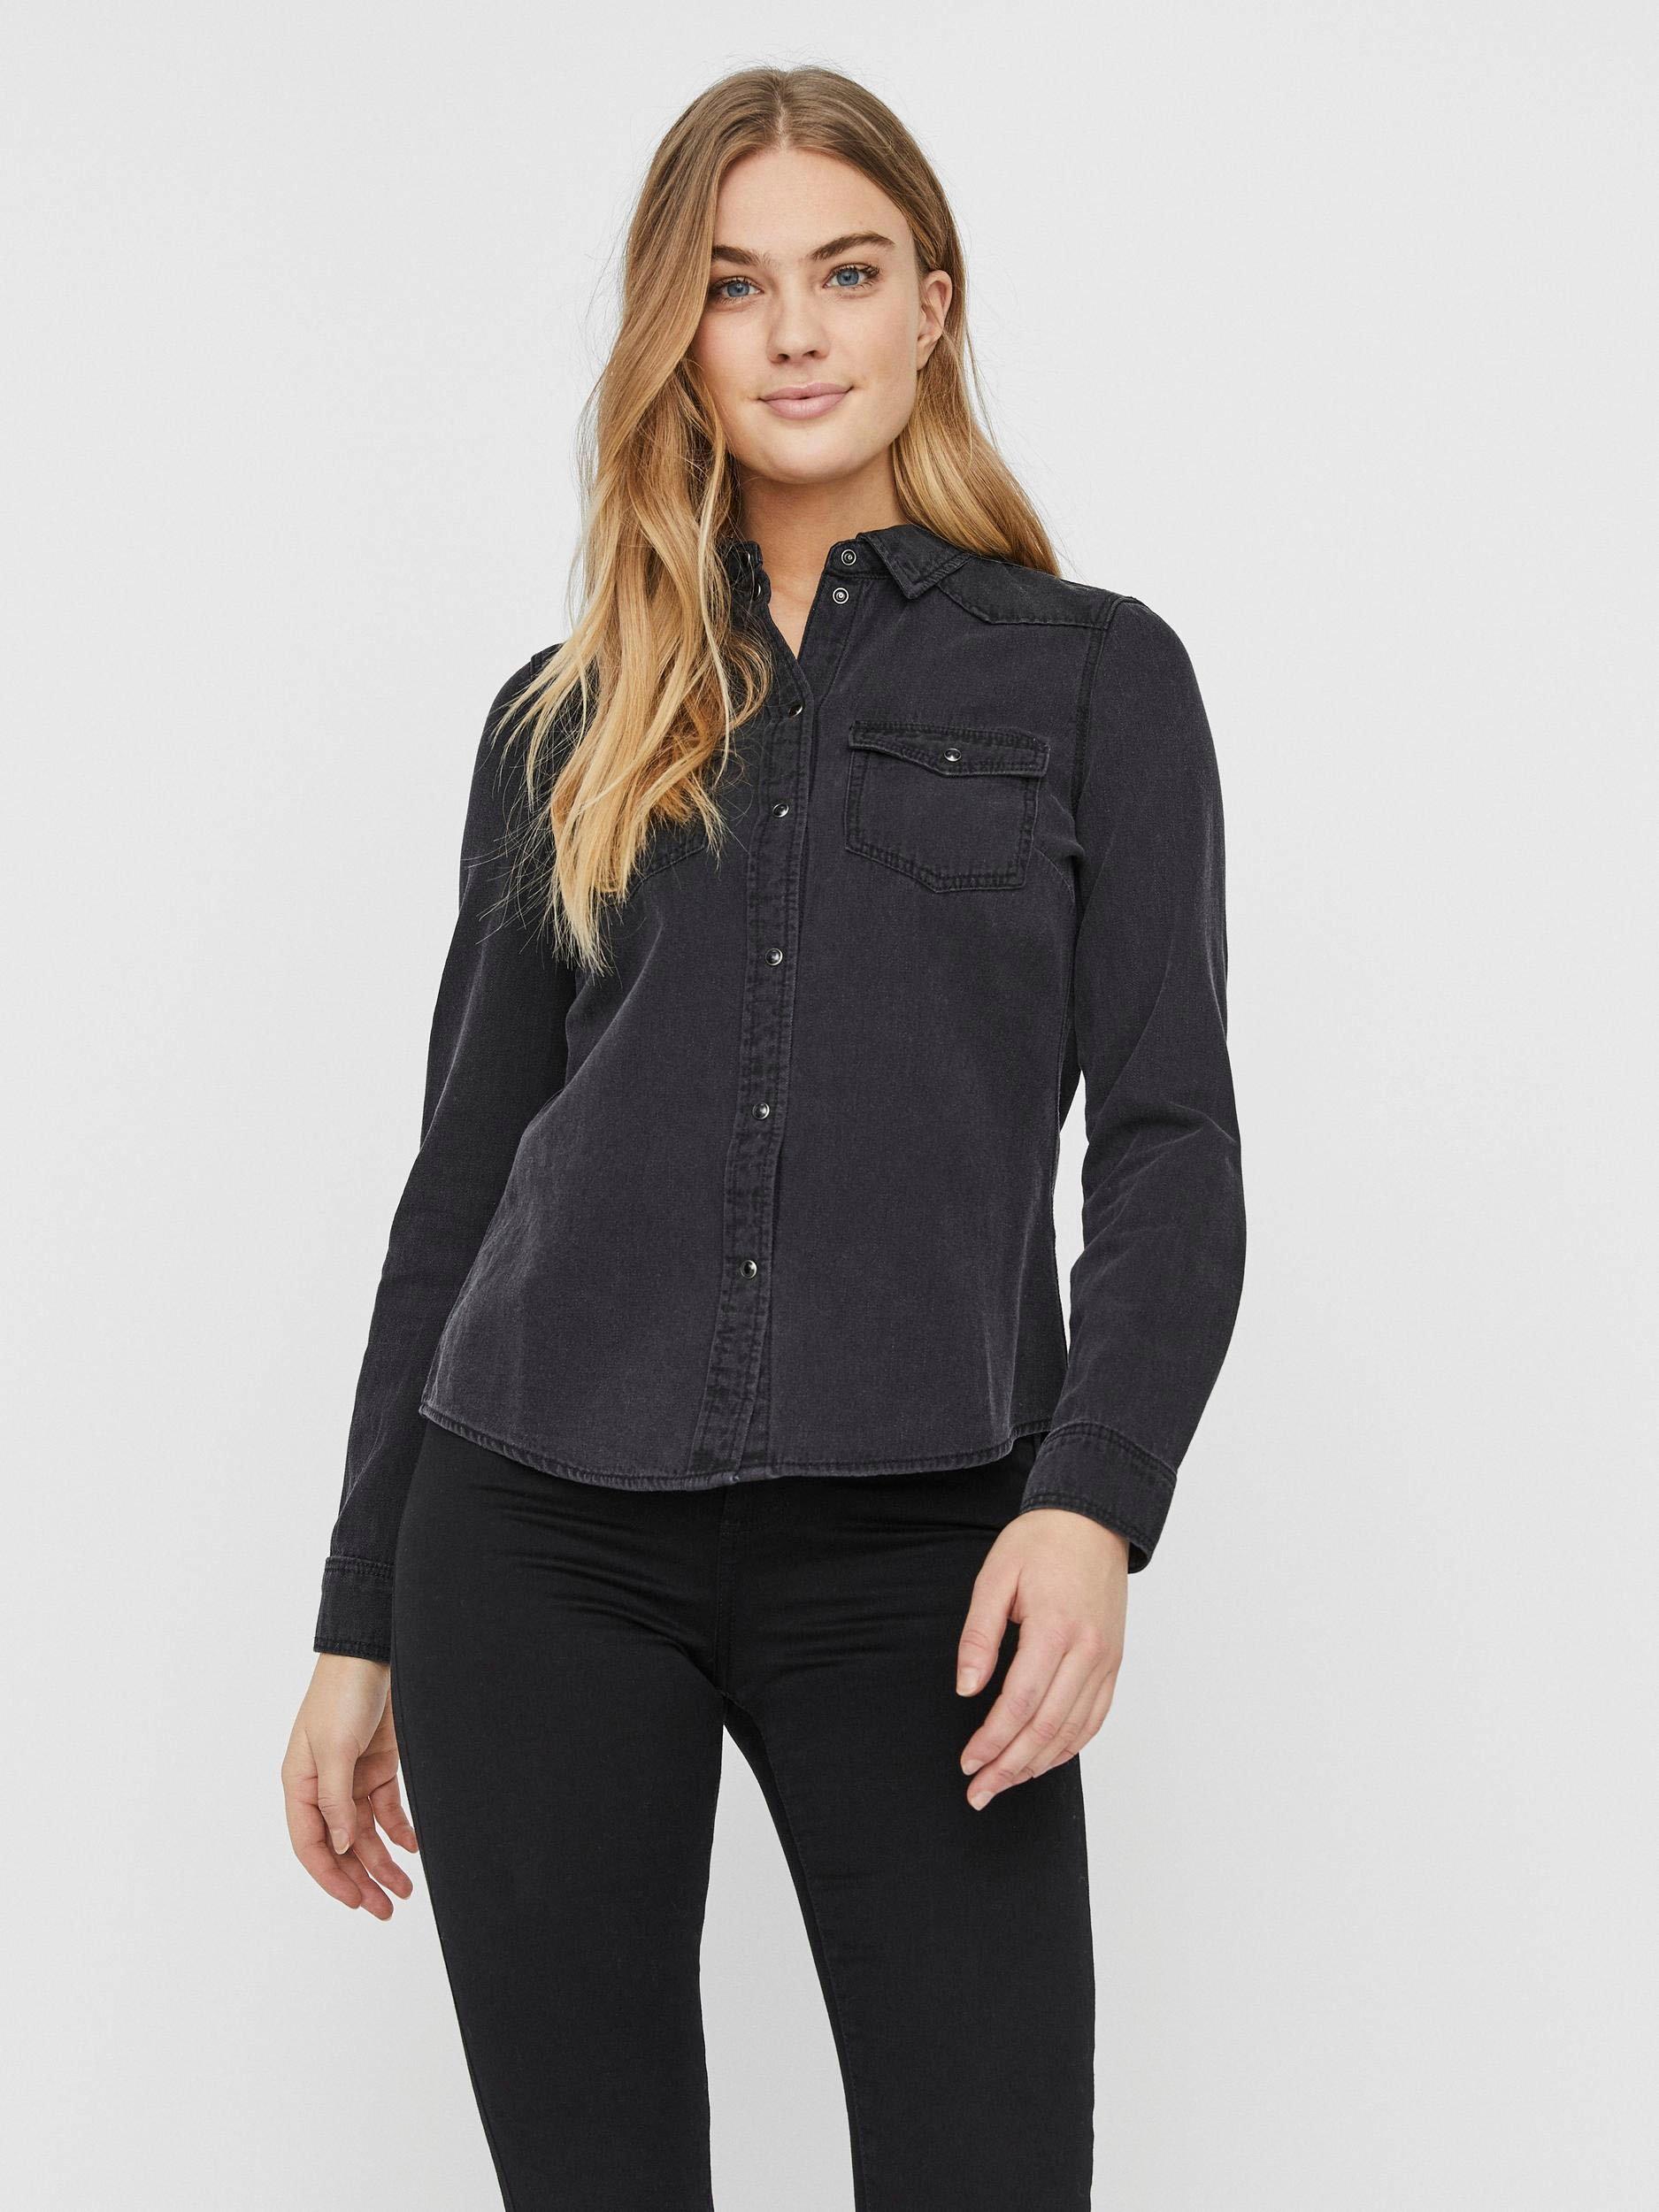 Vero Moda jeansblouse VMMARIA online kopen op otto.nl